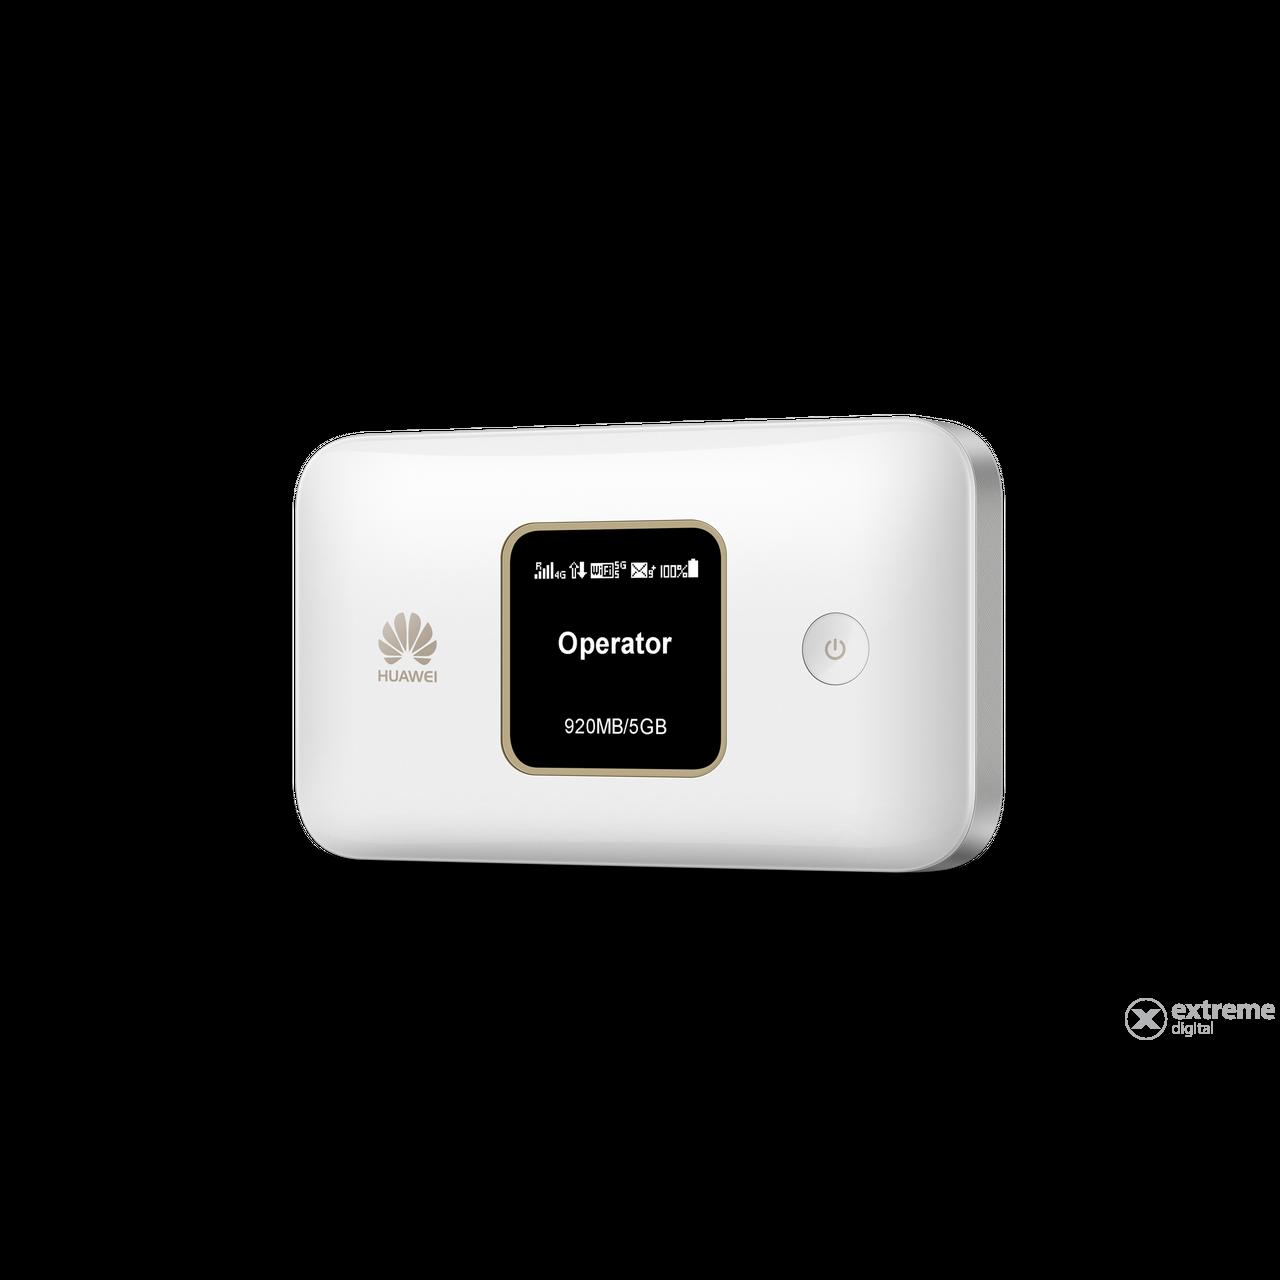 huawei e5785lh 22c mobiler wlan router wei extreme digital. Black Bedroom Furniture Sets. Home Design Ideas